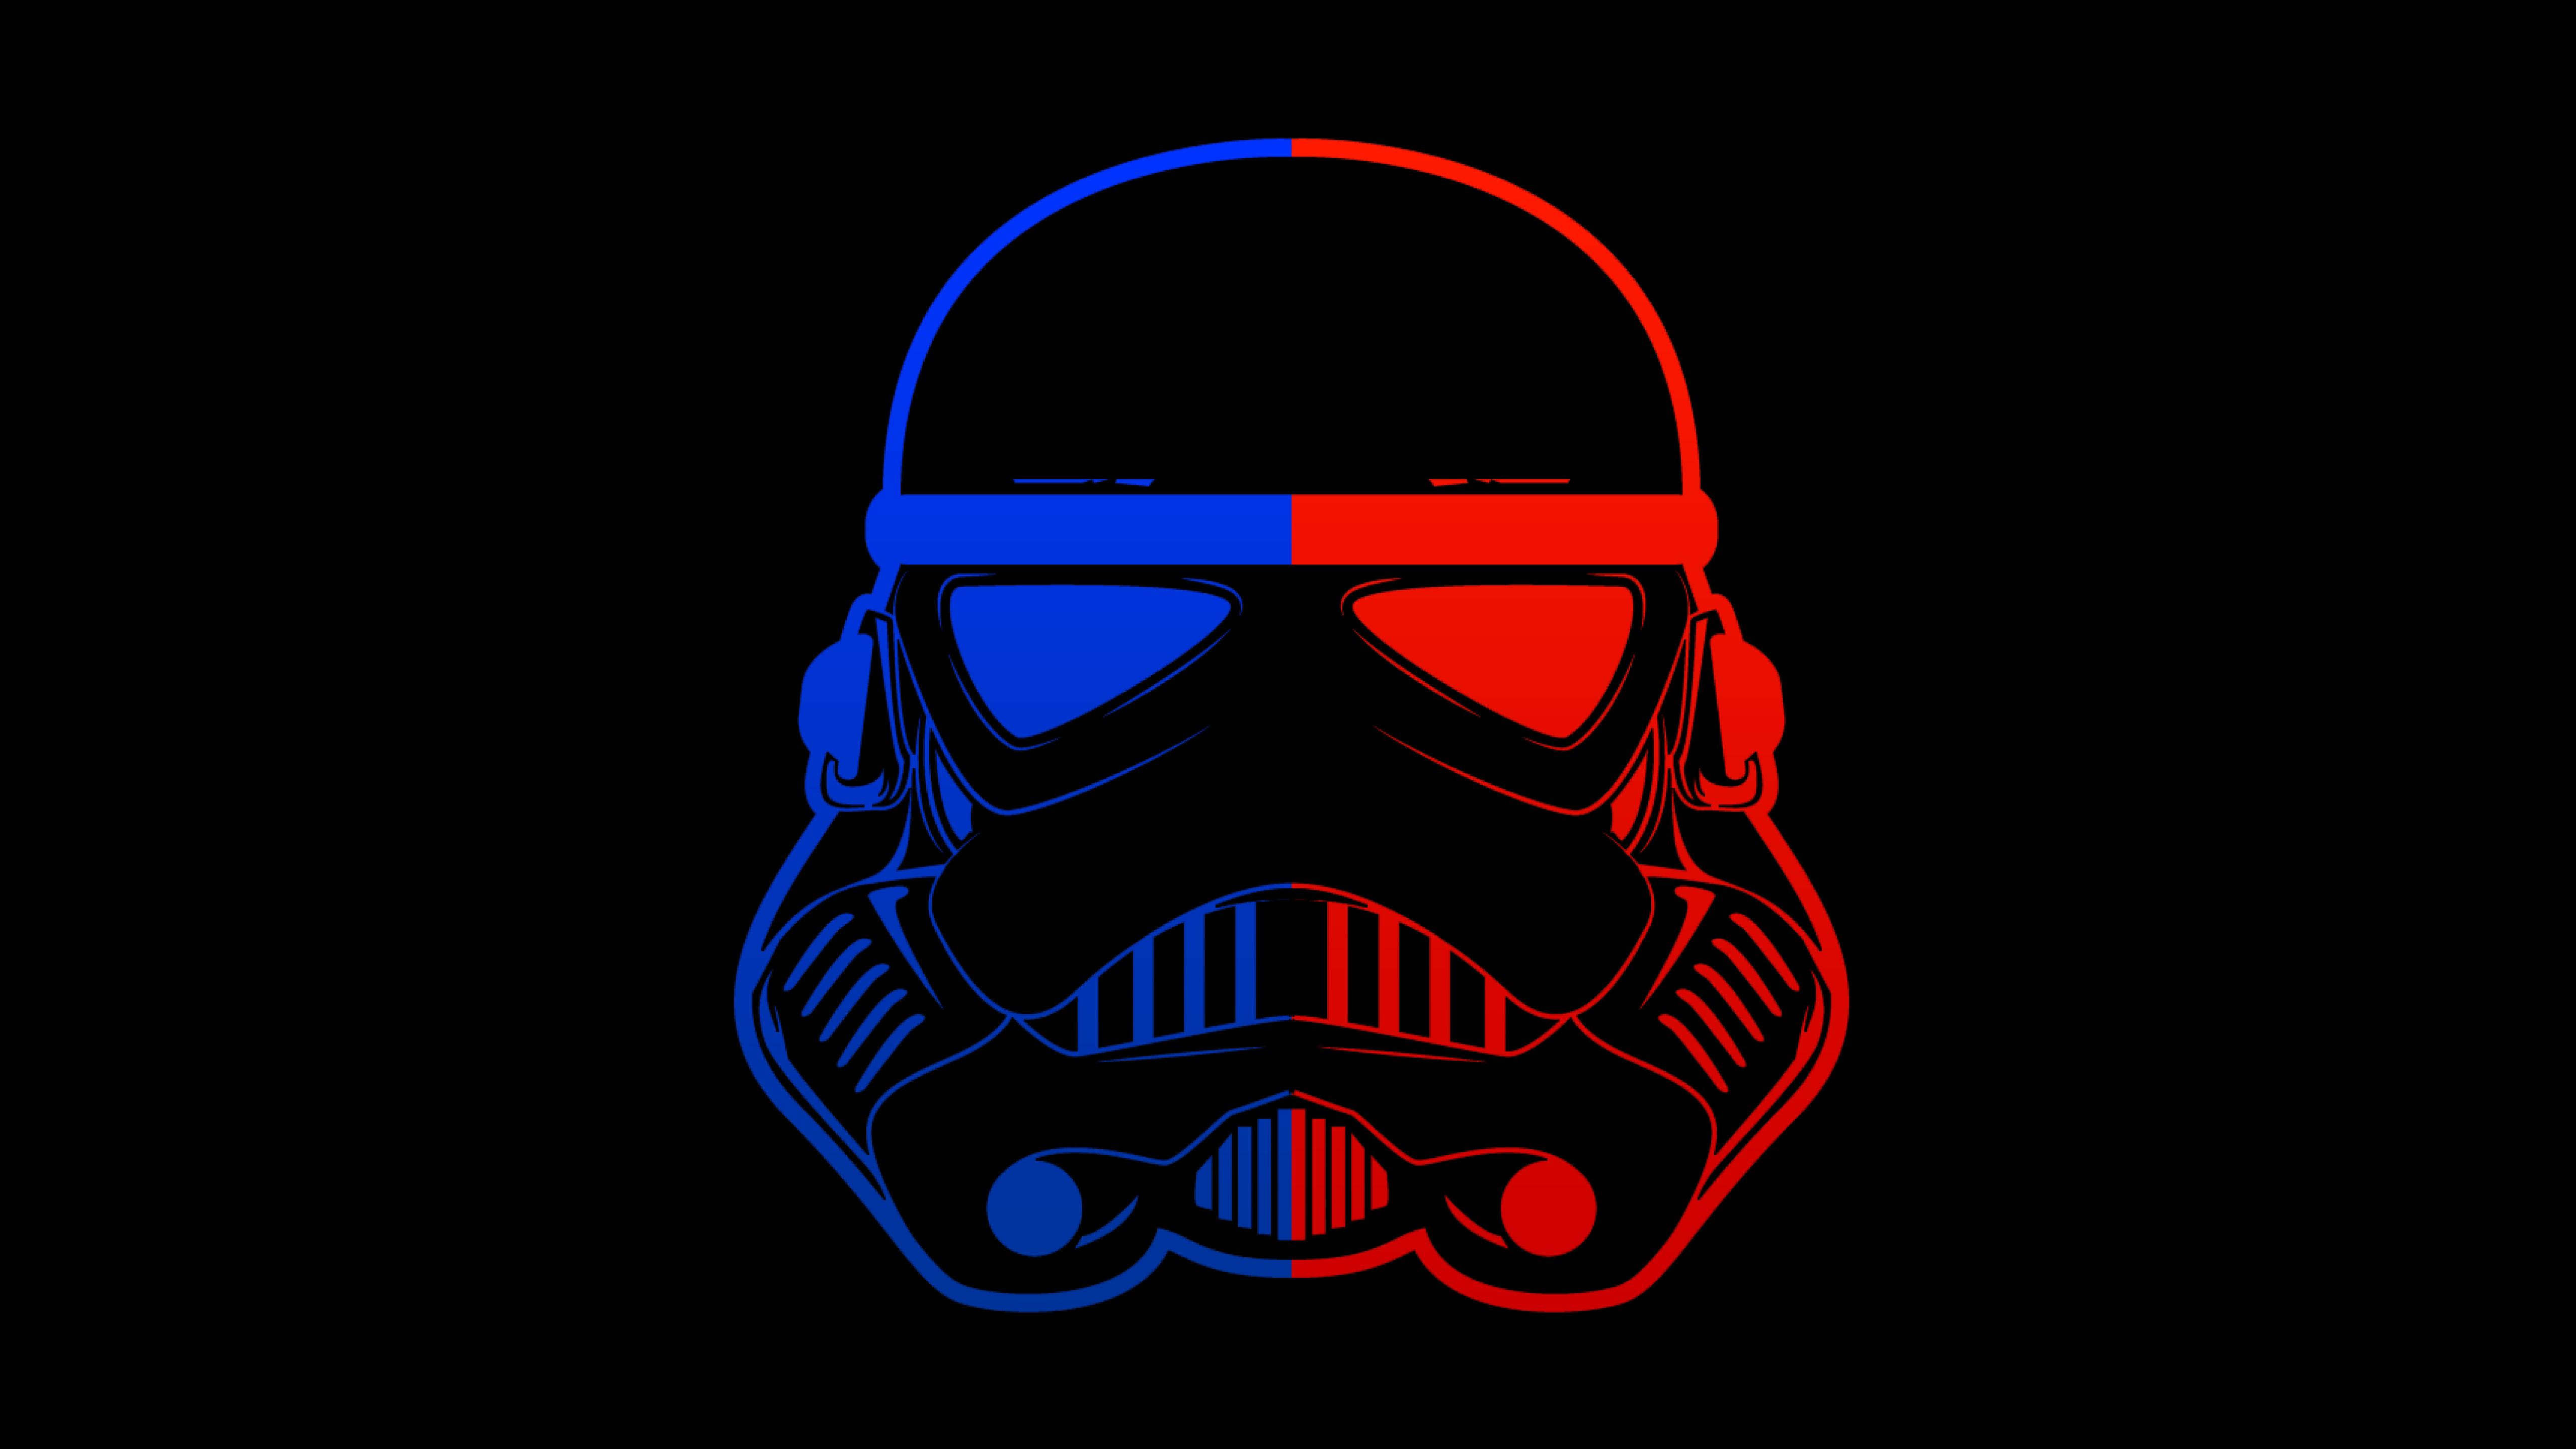 stormtrooper-blue-red-mask-minimal-8k-q1.jpg